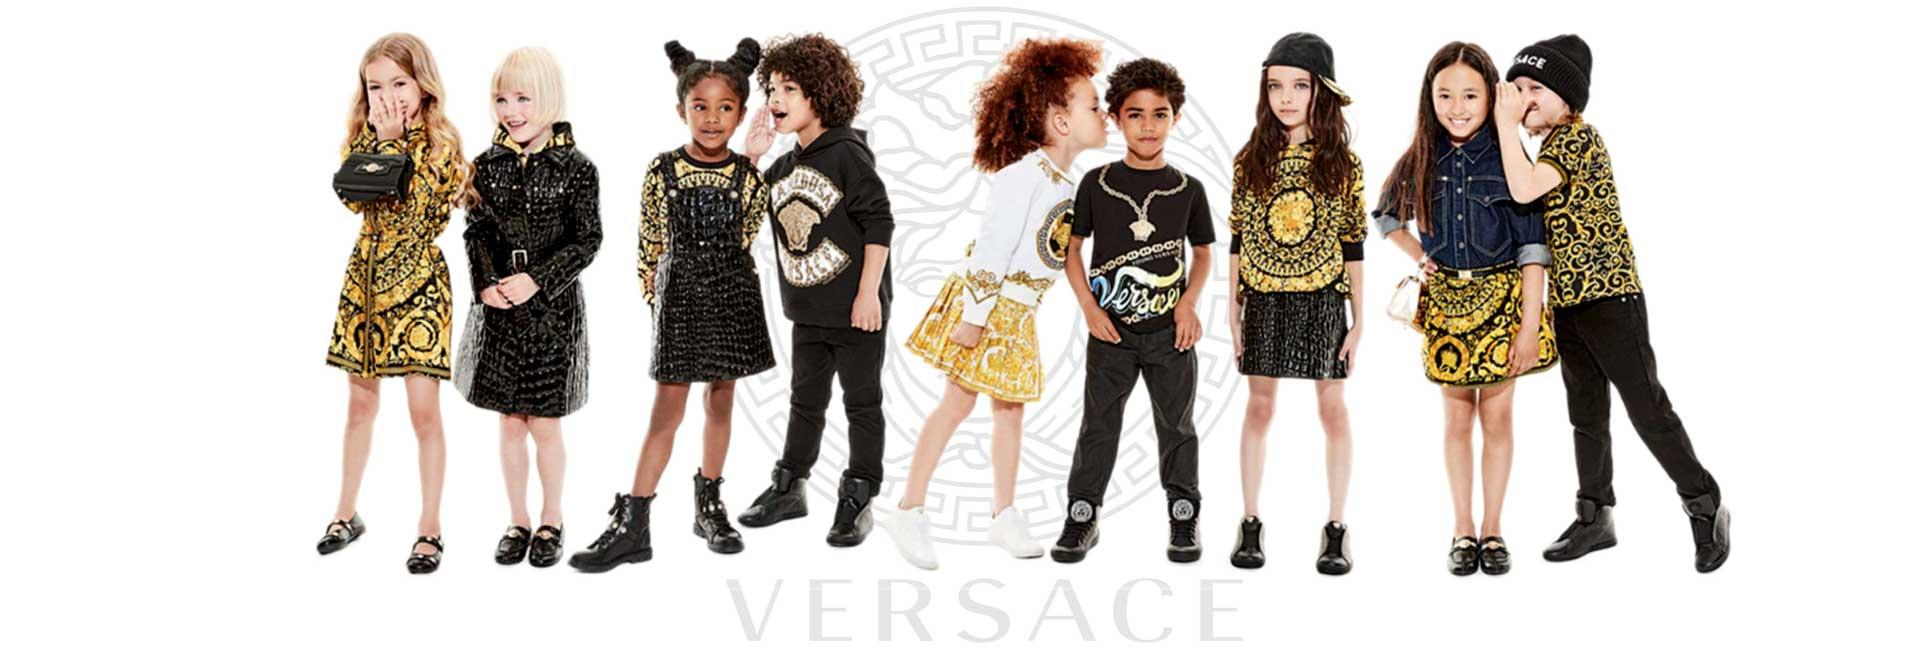 versace shq9 1 - جیانی ورساچه versace